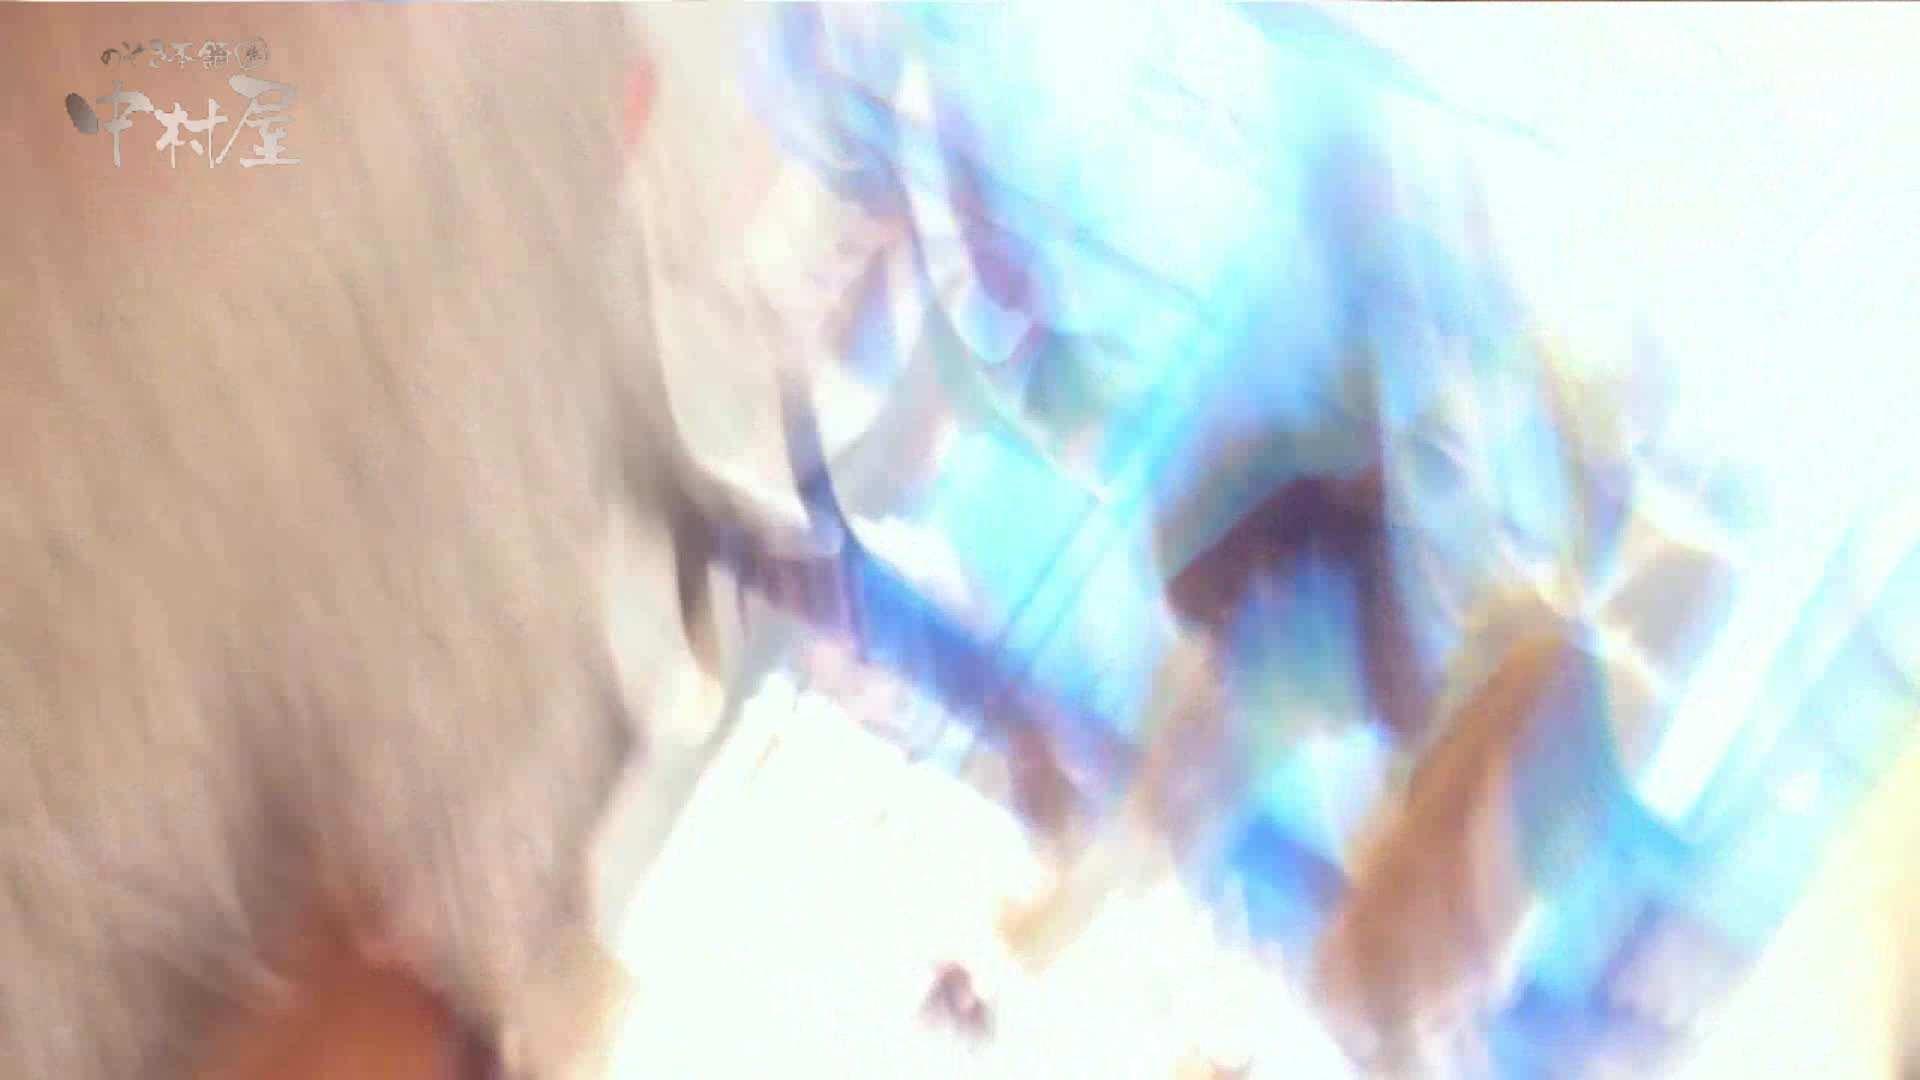 vol.73 美人アパレル胸チラ&パンチラ 目の下のホクロがエッチな店員さん エッチ 盗み撮りAV無料動画キャプチャ 103画像 23